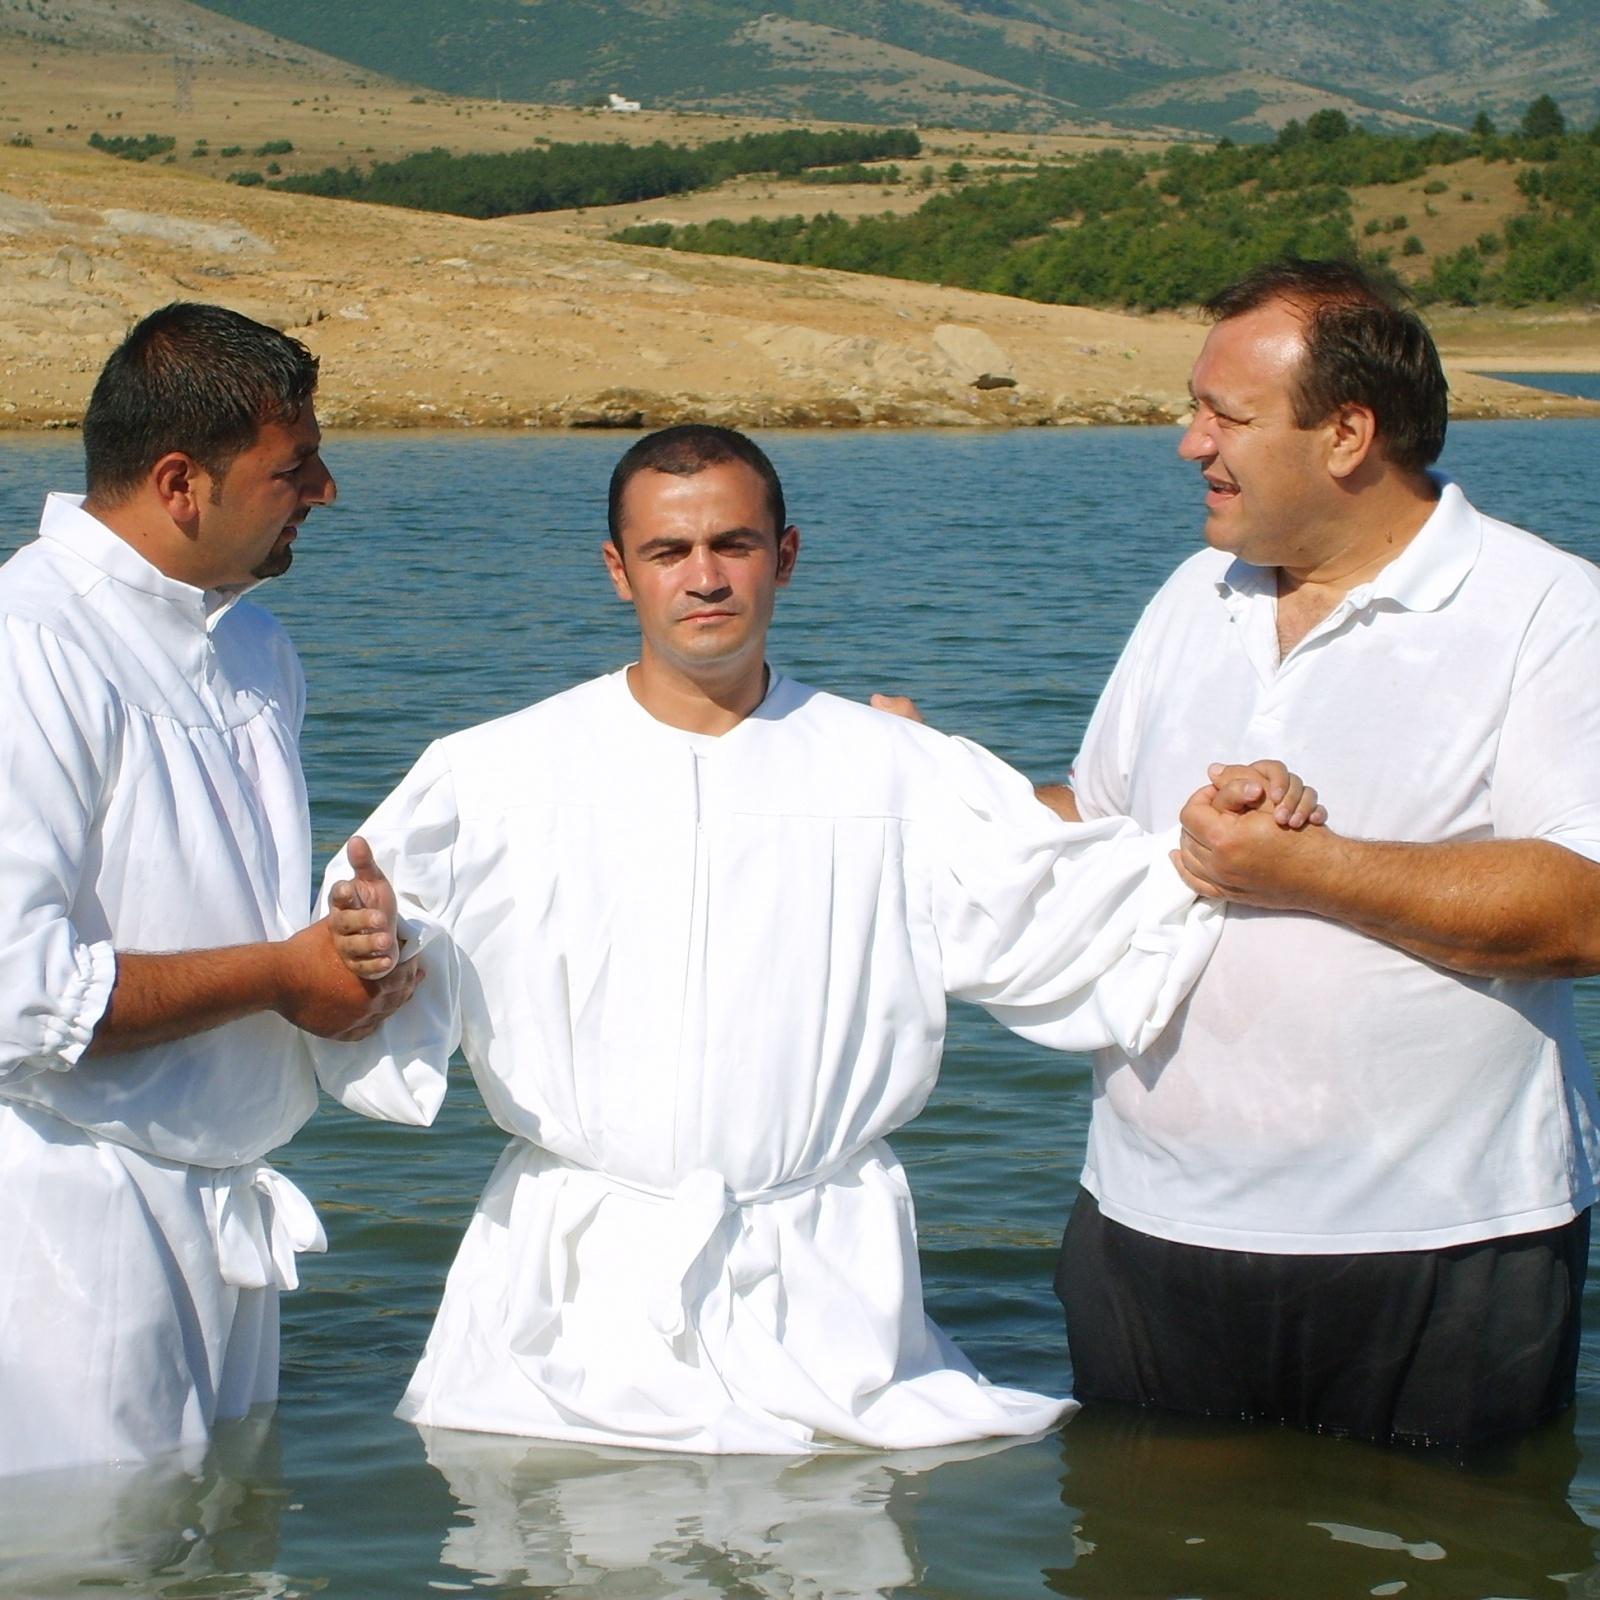 Macedonia baptism